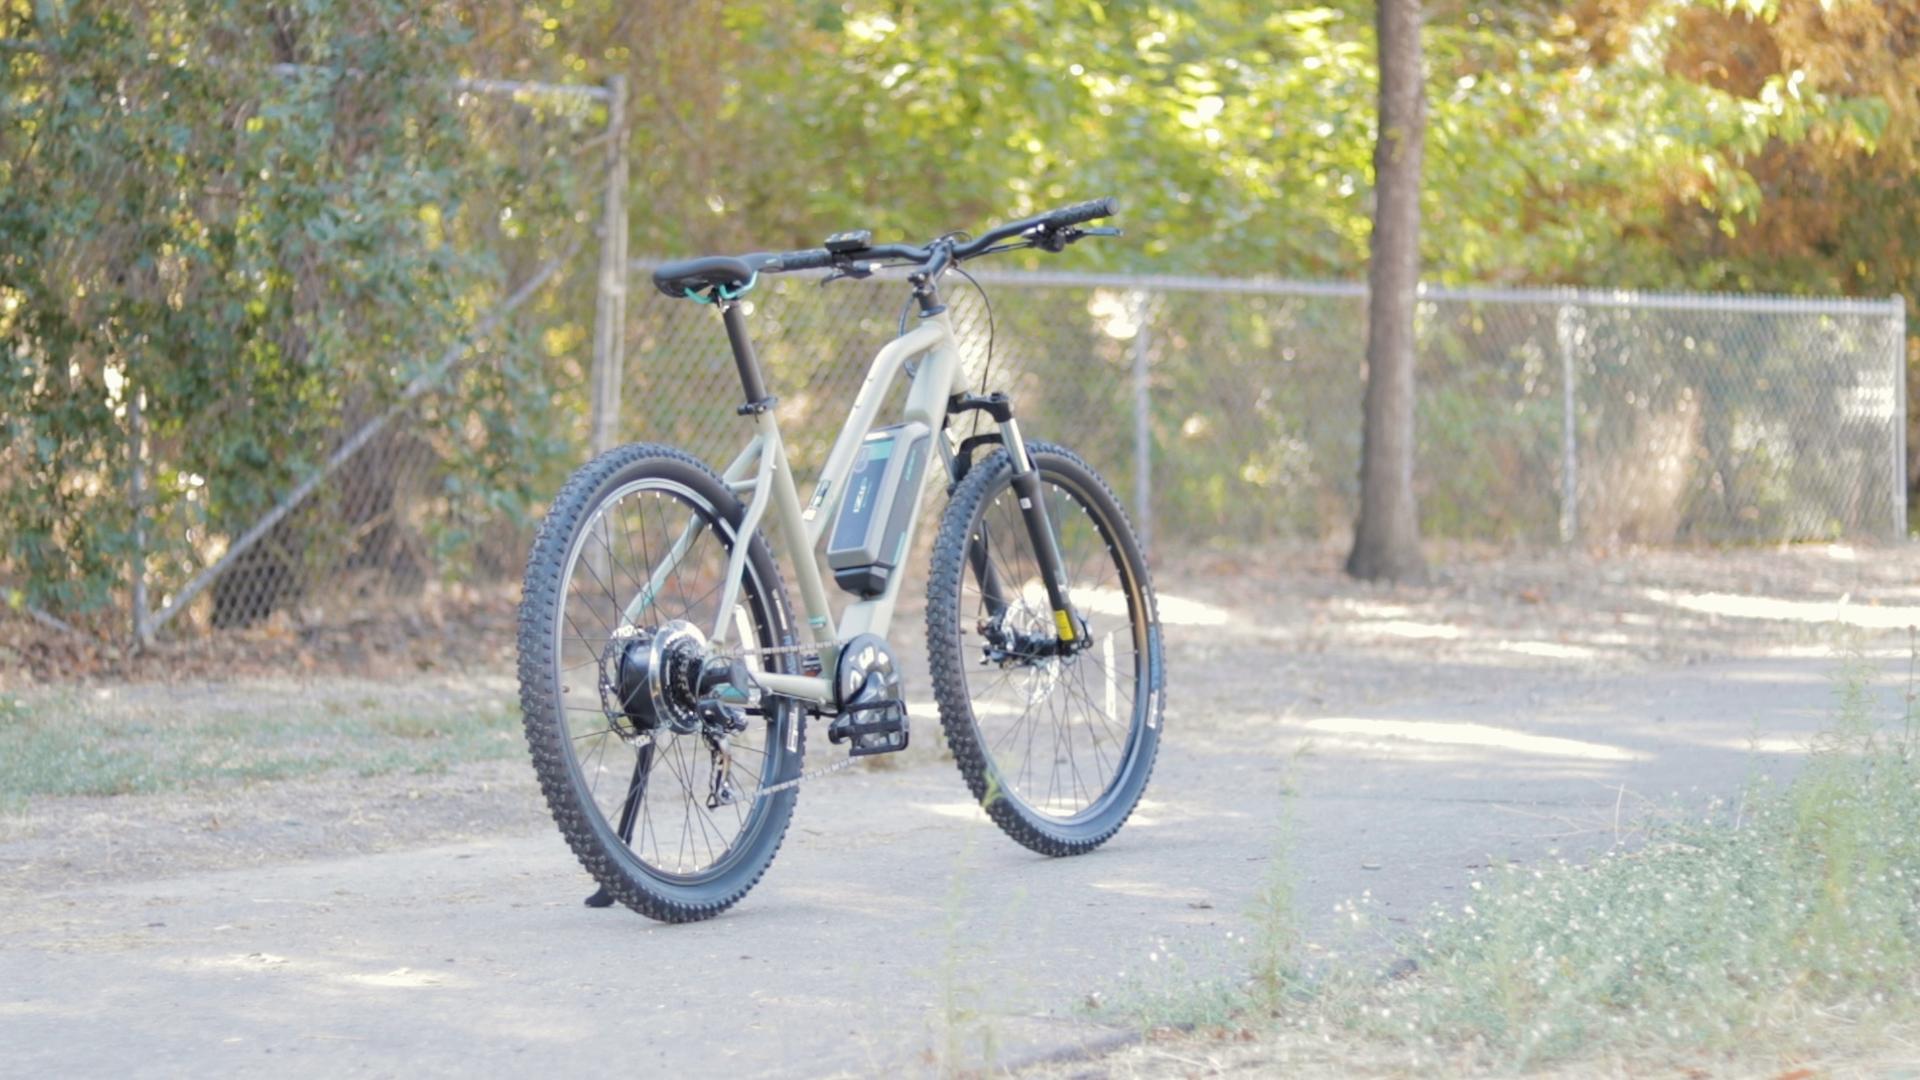 electrified-reviews-izip-trlz-electric-bike-review-profile-2.jpg